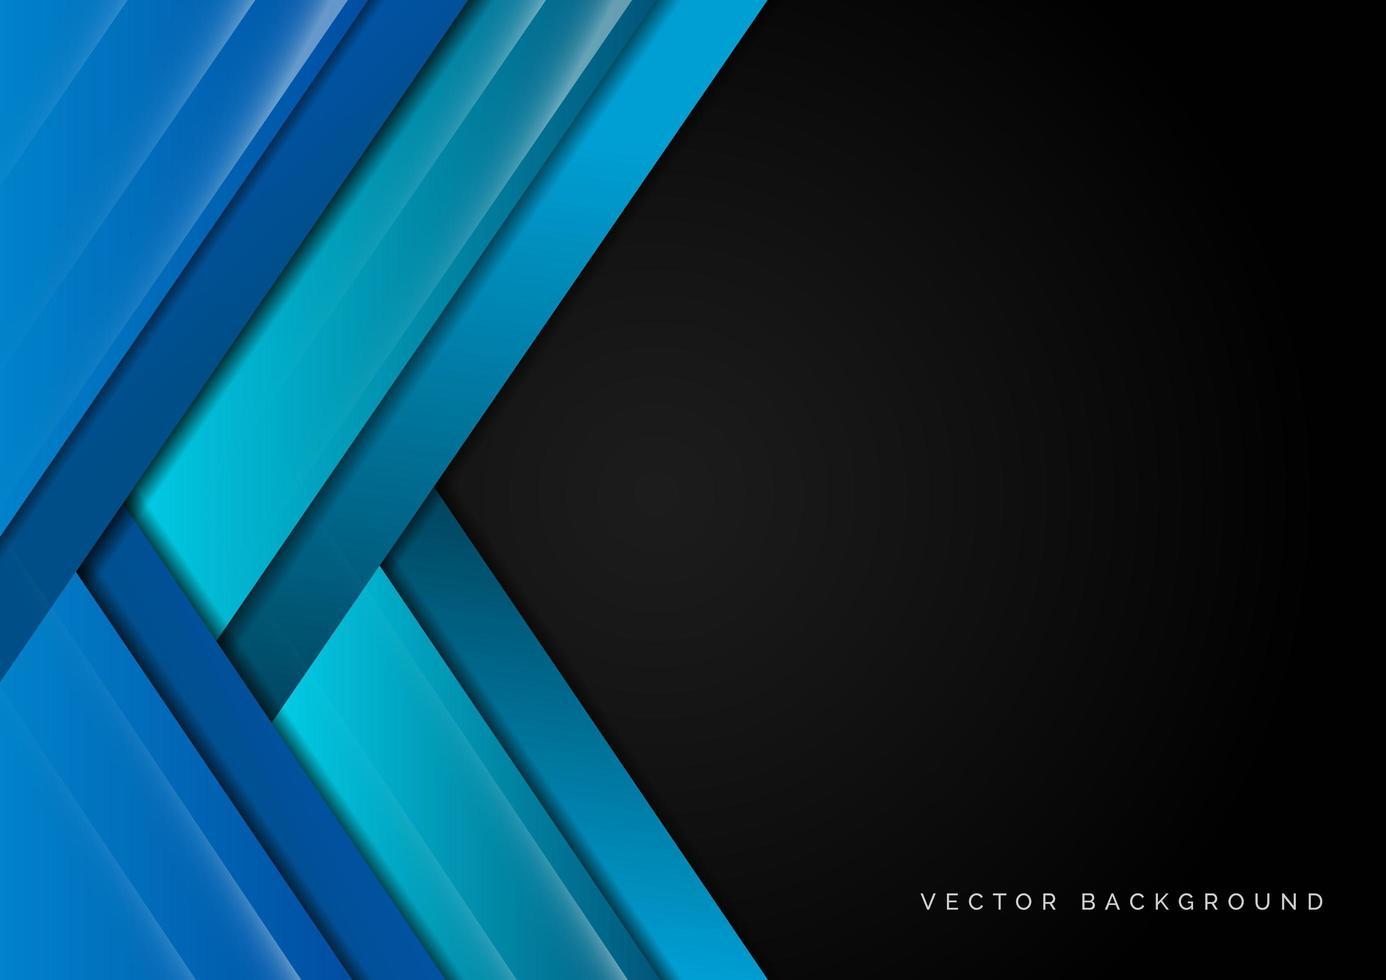 diseño de plantilla abstracta con elementos azules vector